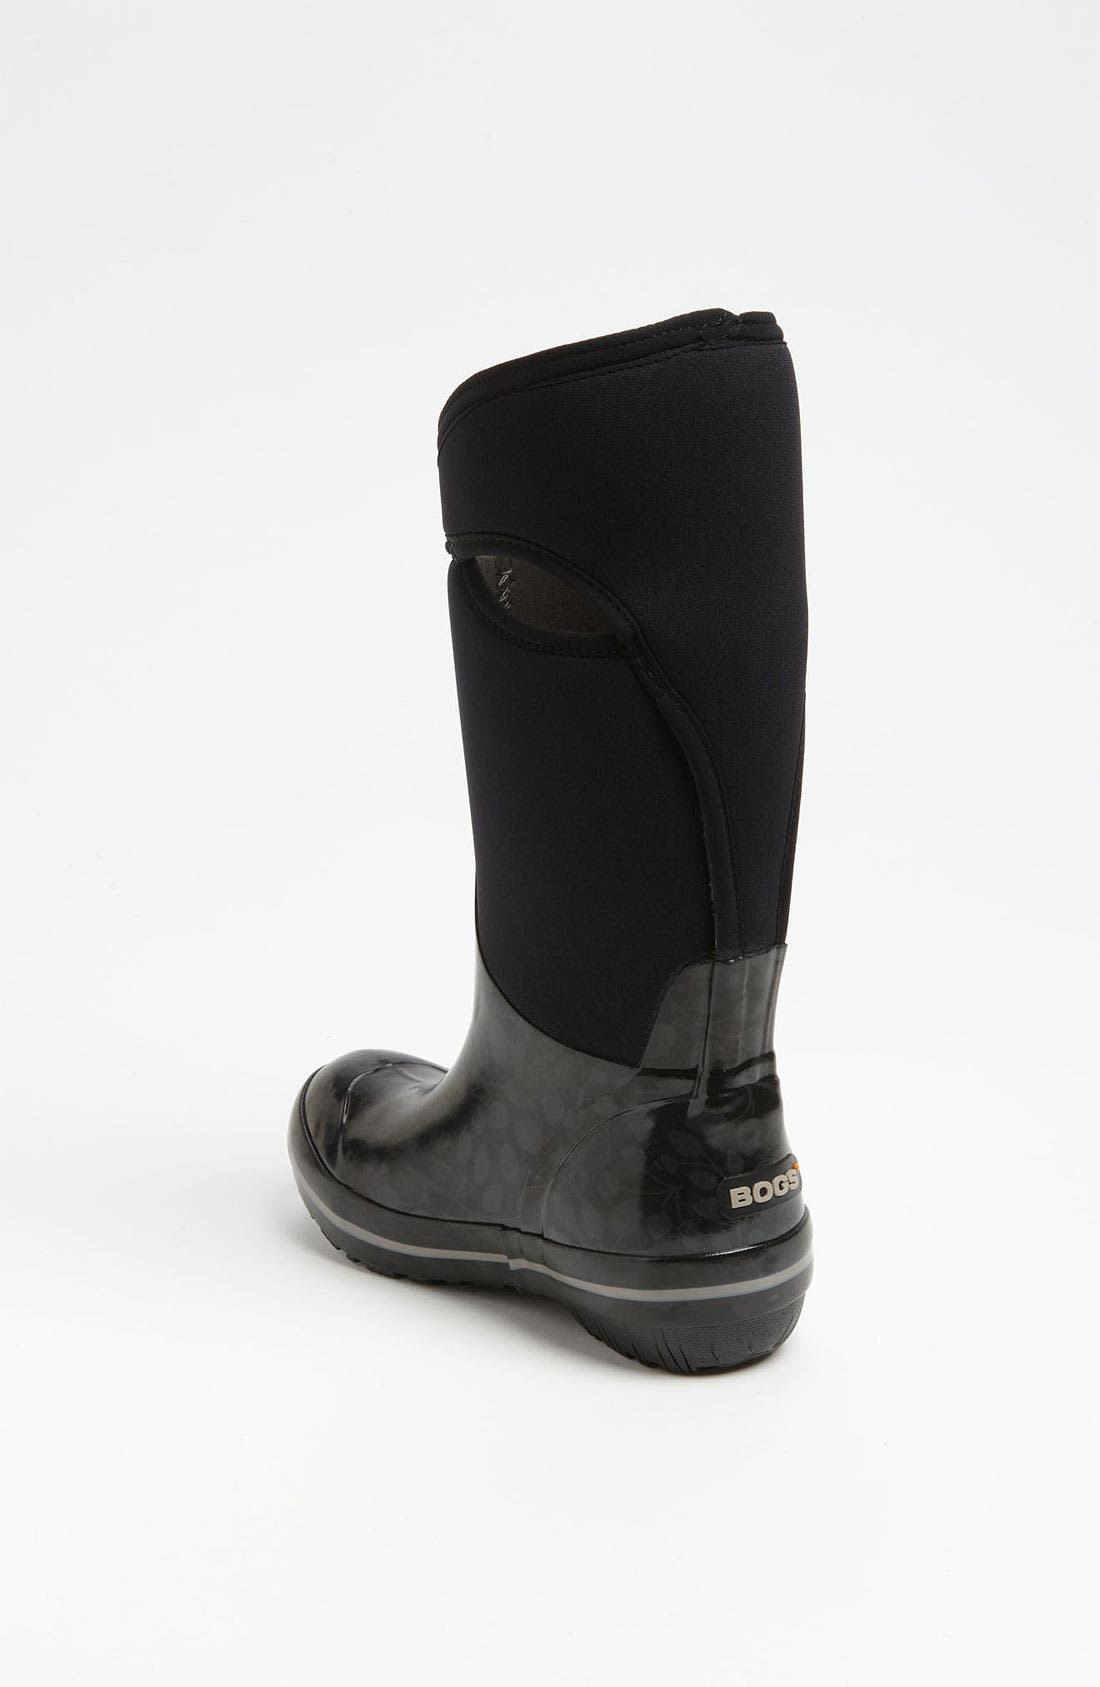 Alternate Image 2  - Bogs 'Plimsoll Tall Leaf' Rain Boot (Women)